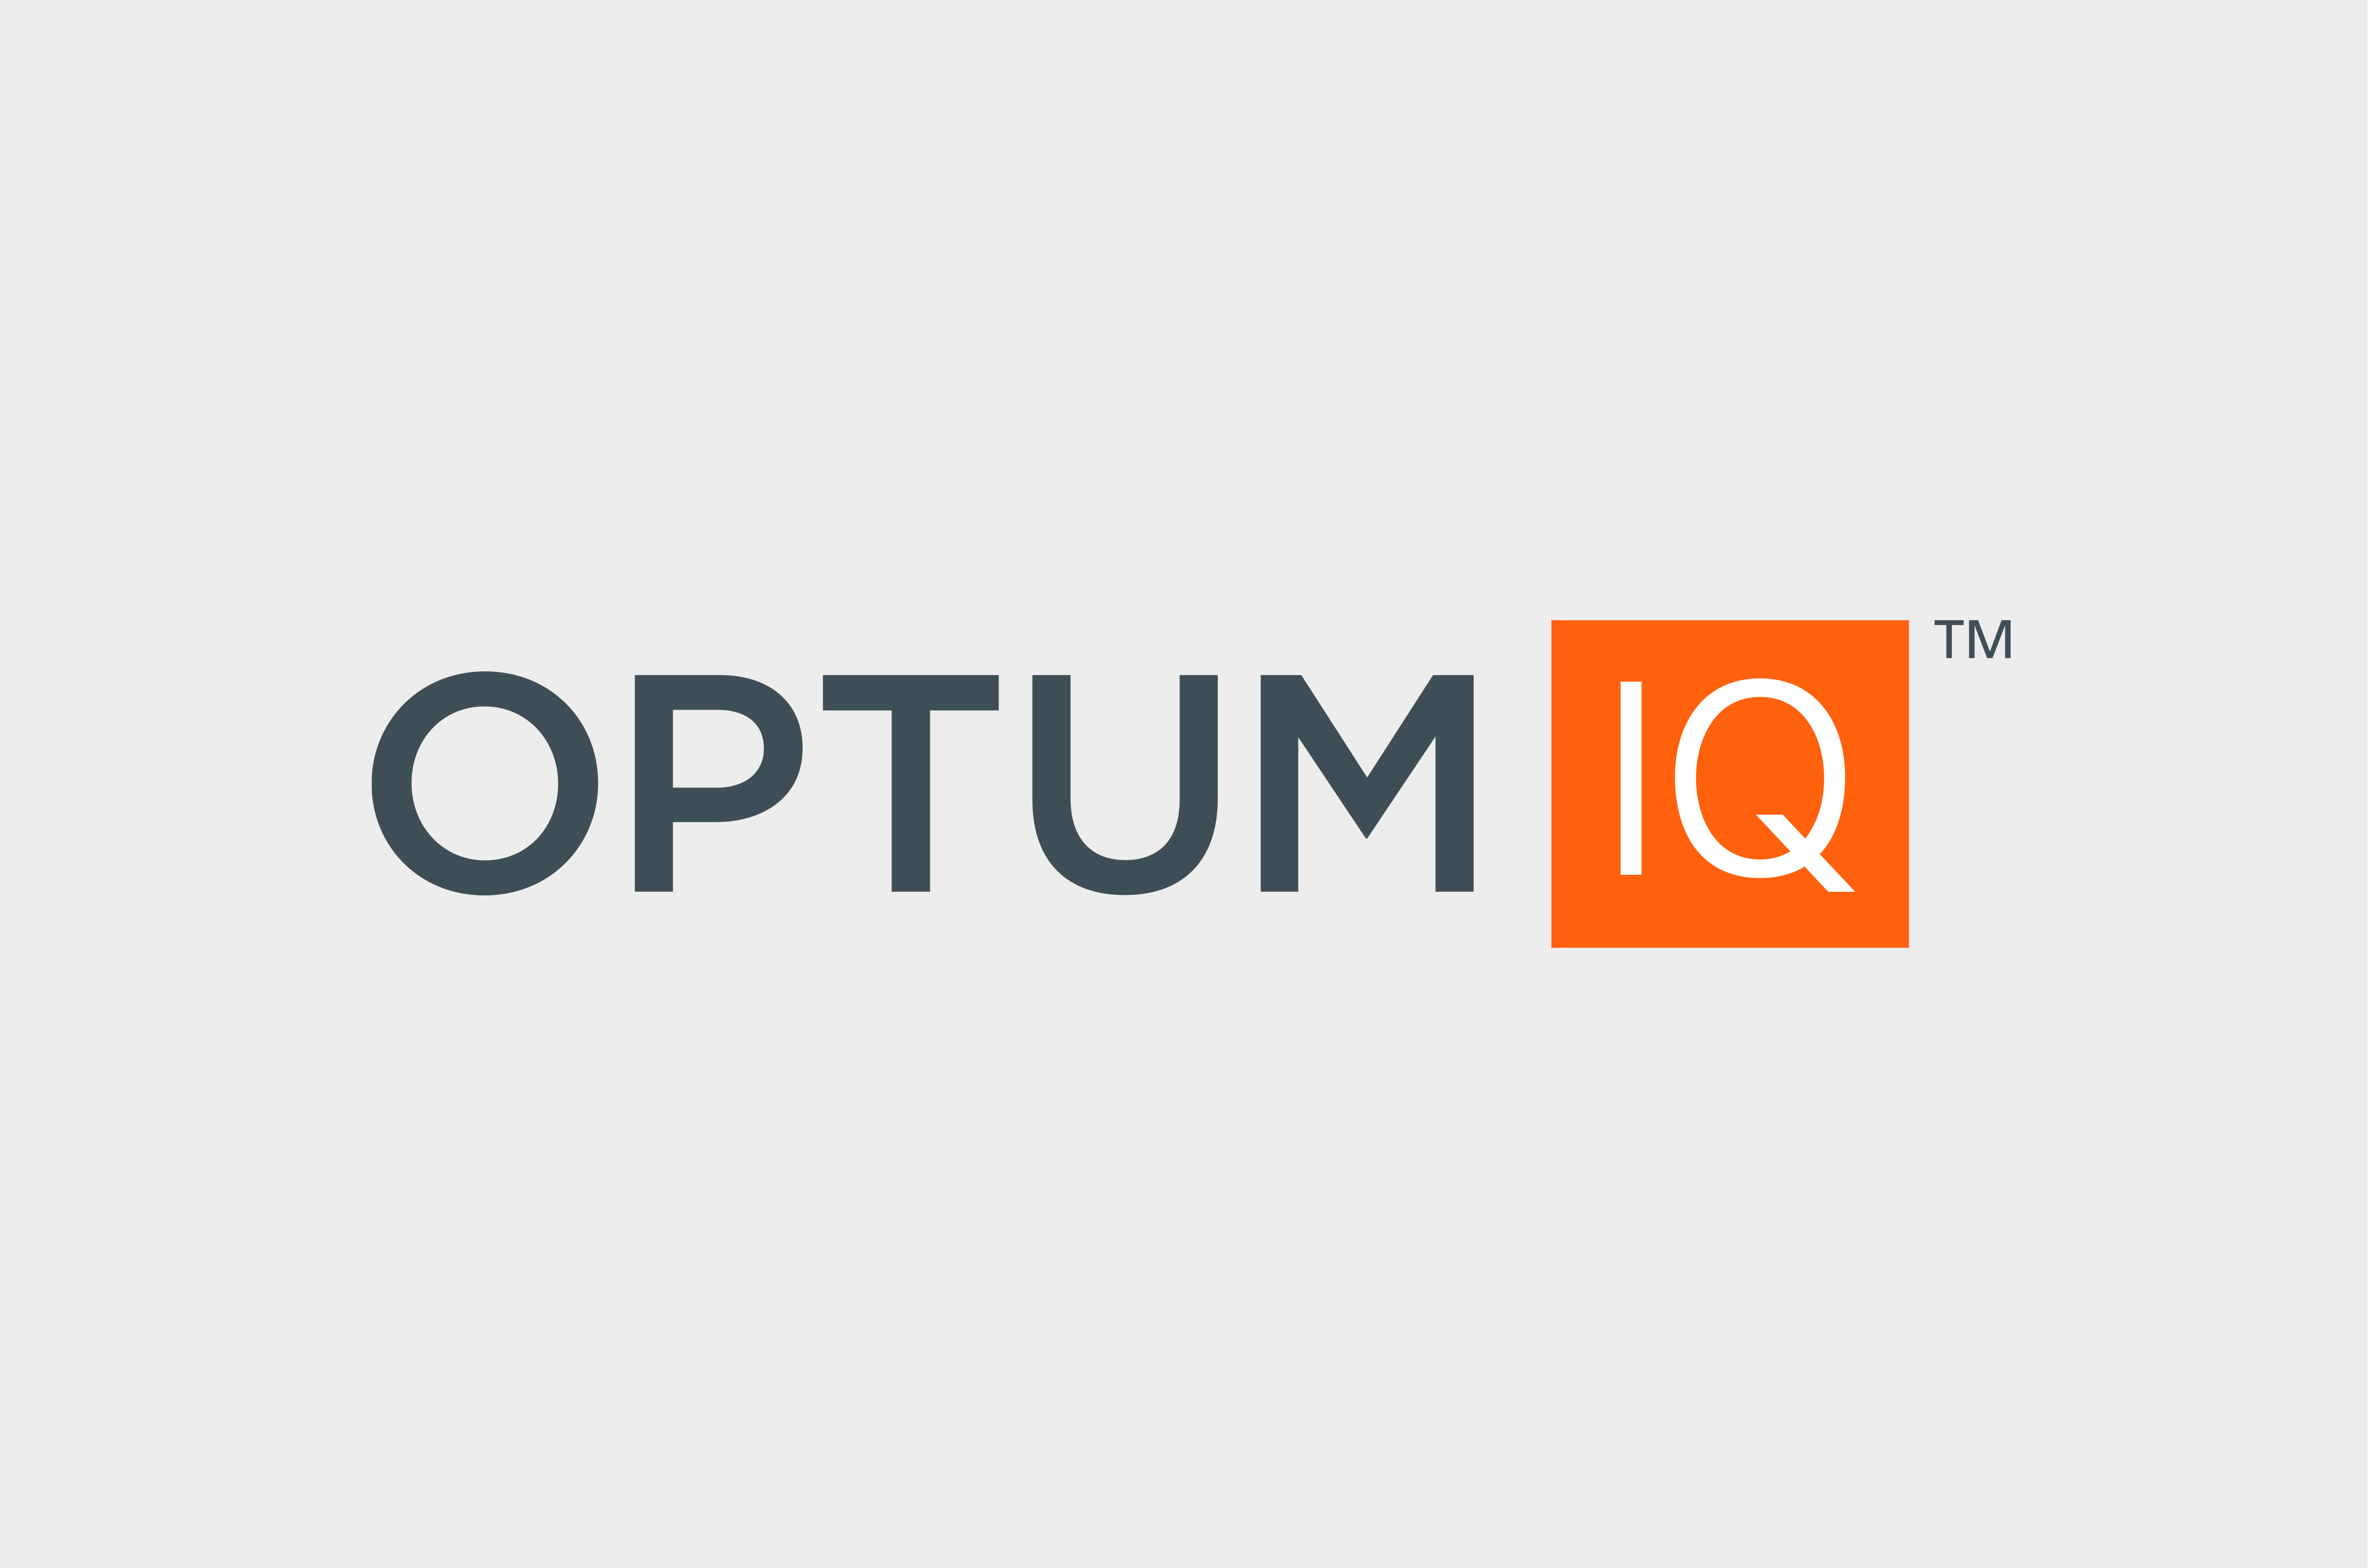 optum.image.3